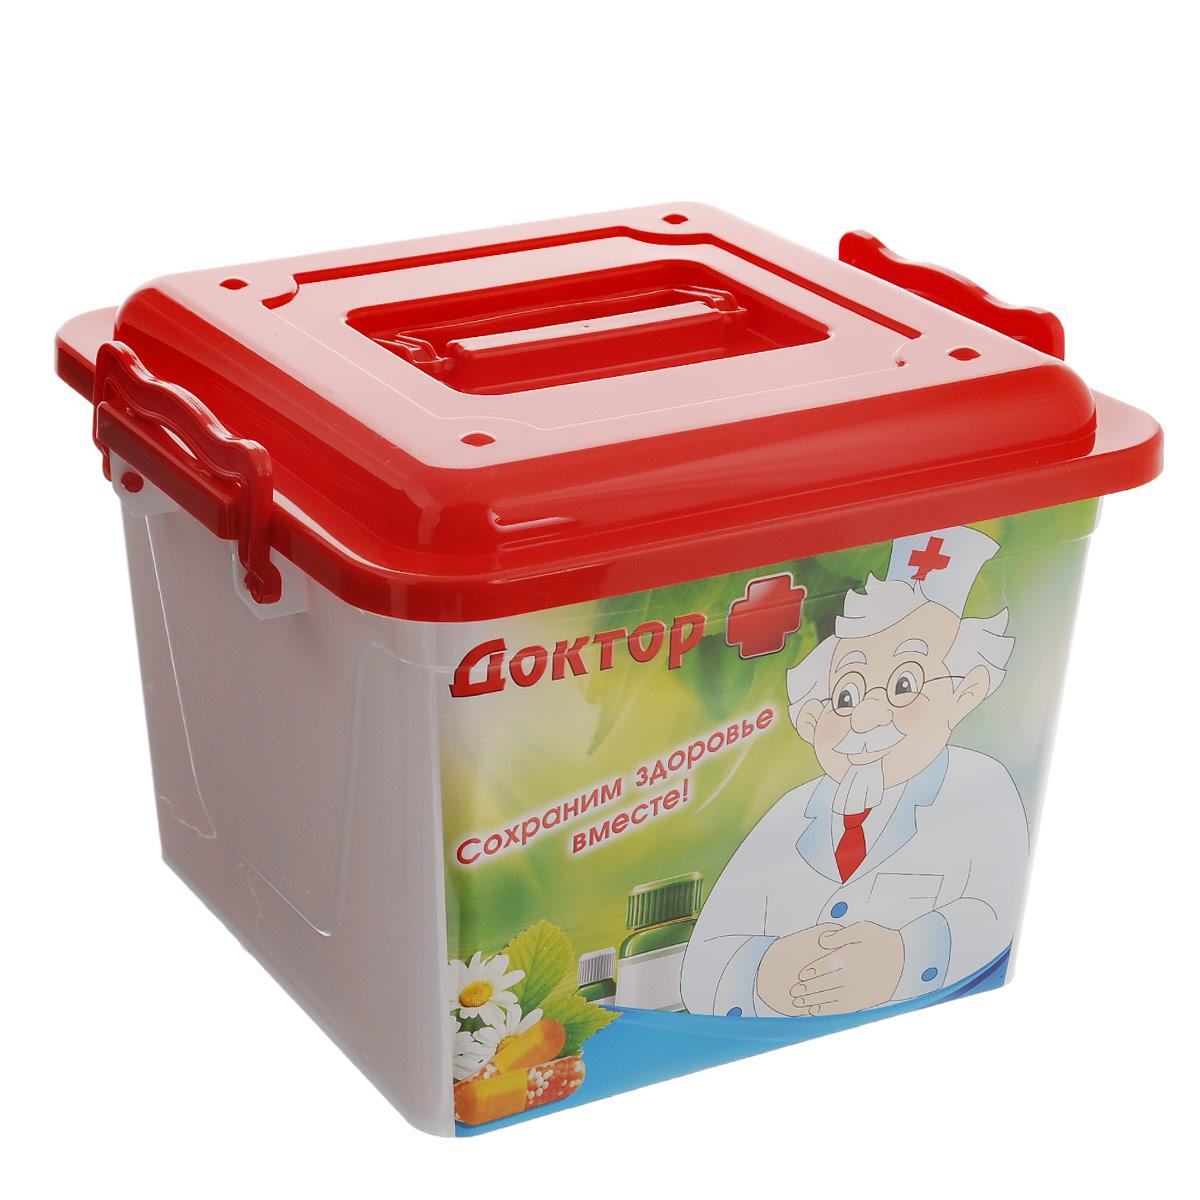 Контейнер Альтернатива Доктор плюс, 8,5 л ящики для игрушек альтернатива башпласт контейнер лапландия 7 л